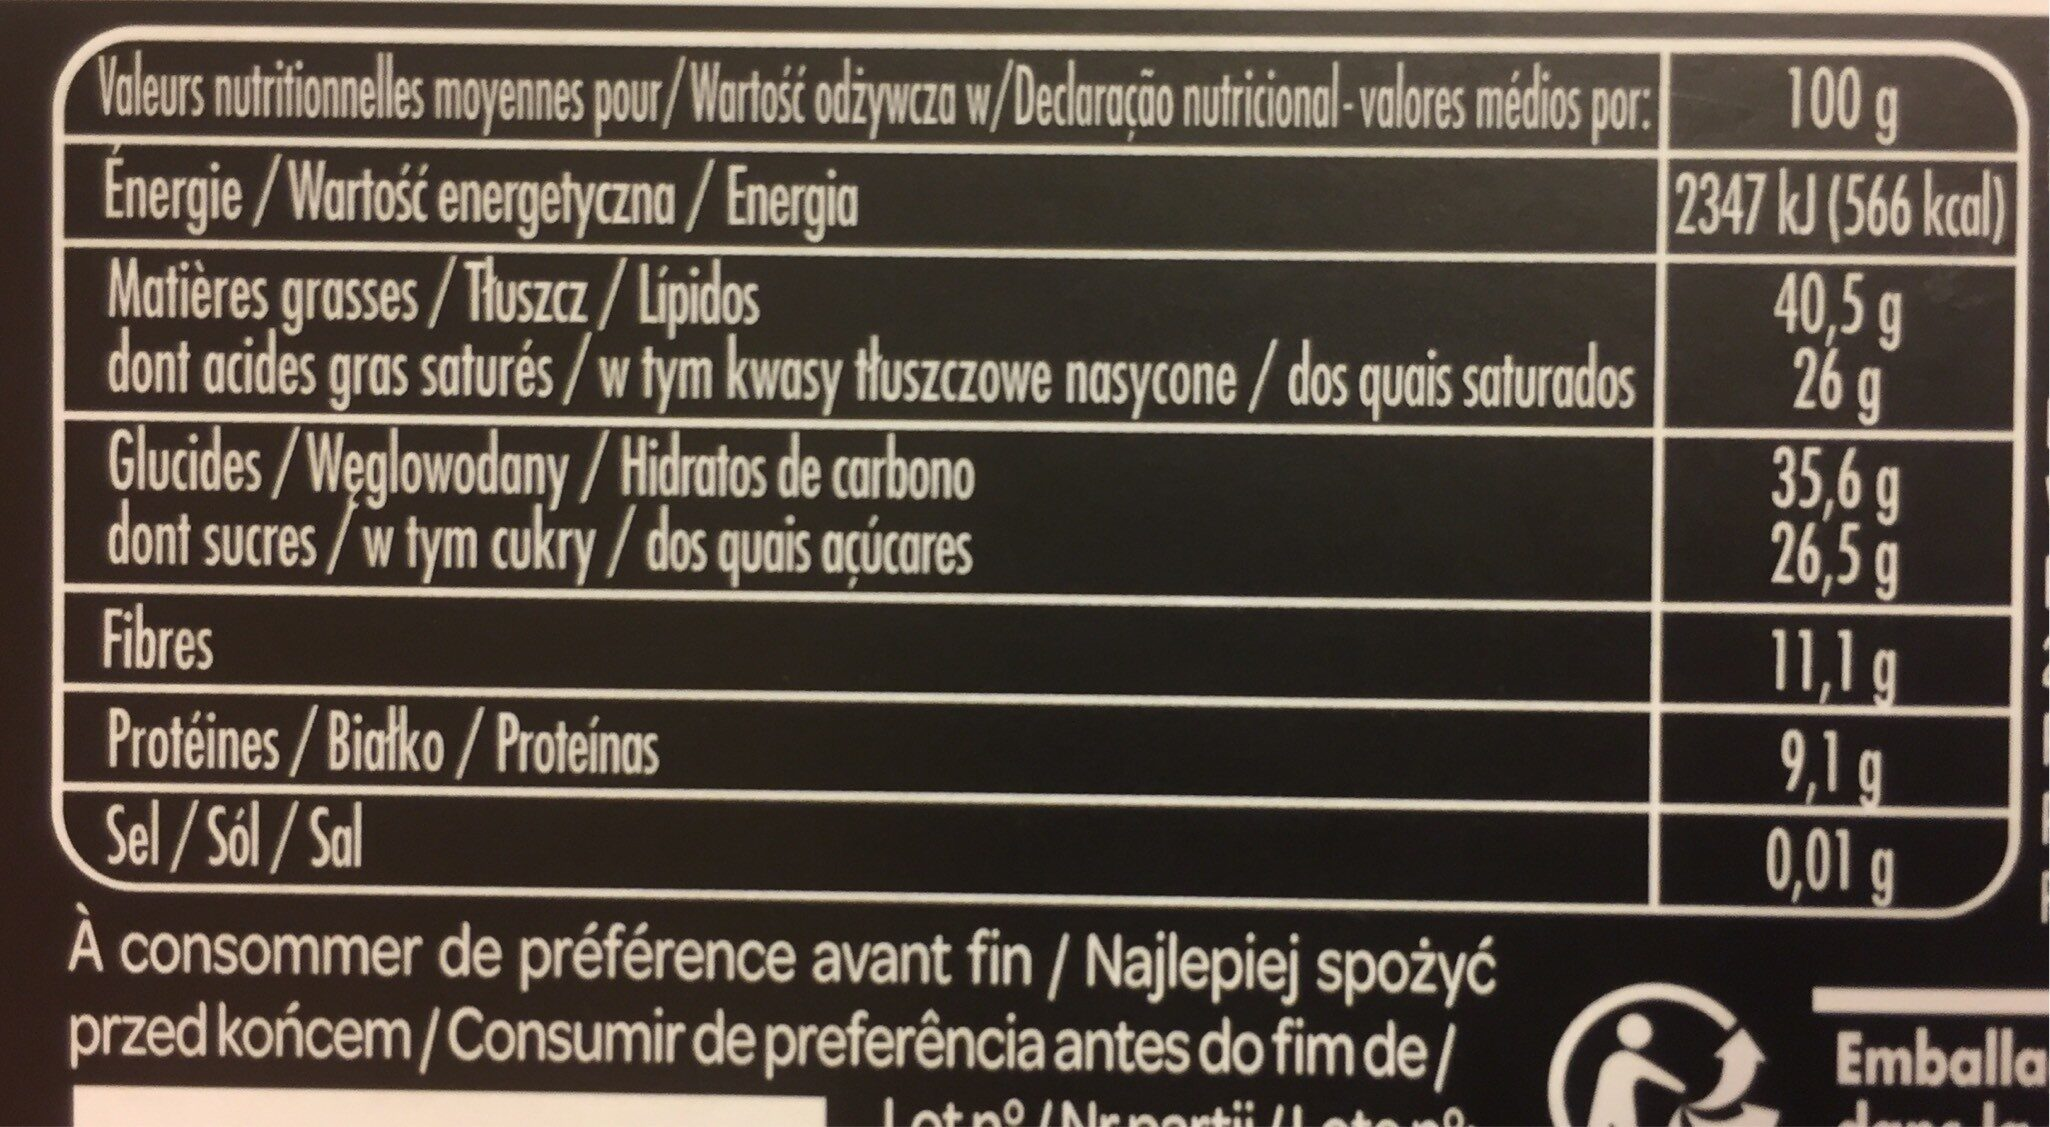 L'envoûtant chocolat noir 70% - Voedingswaarden - fr